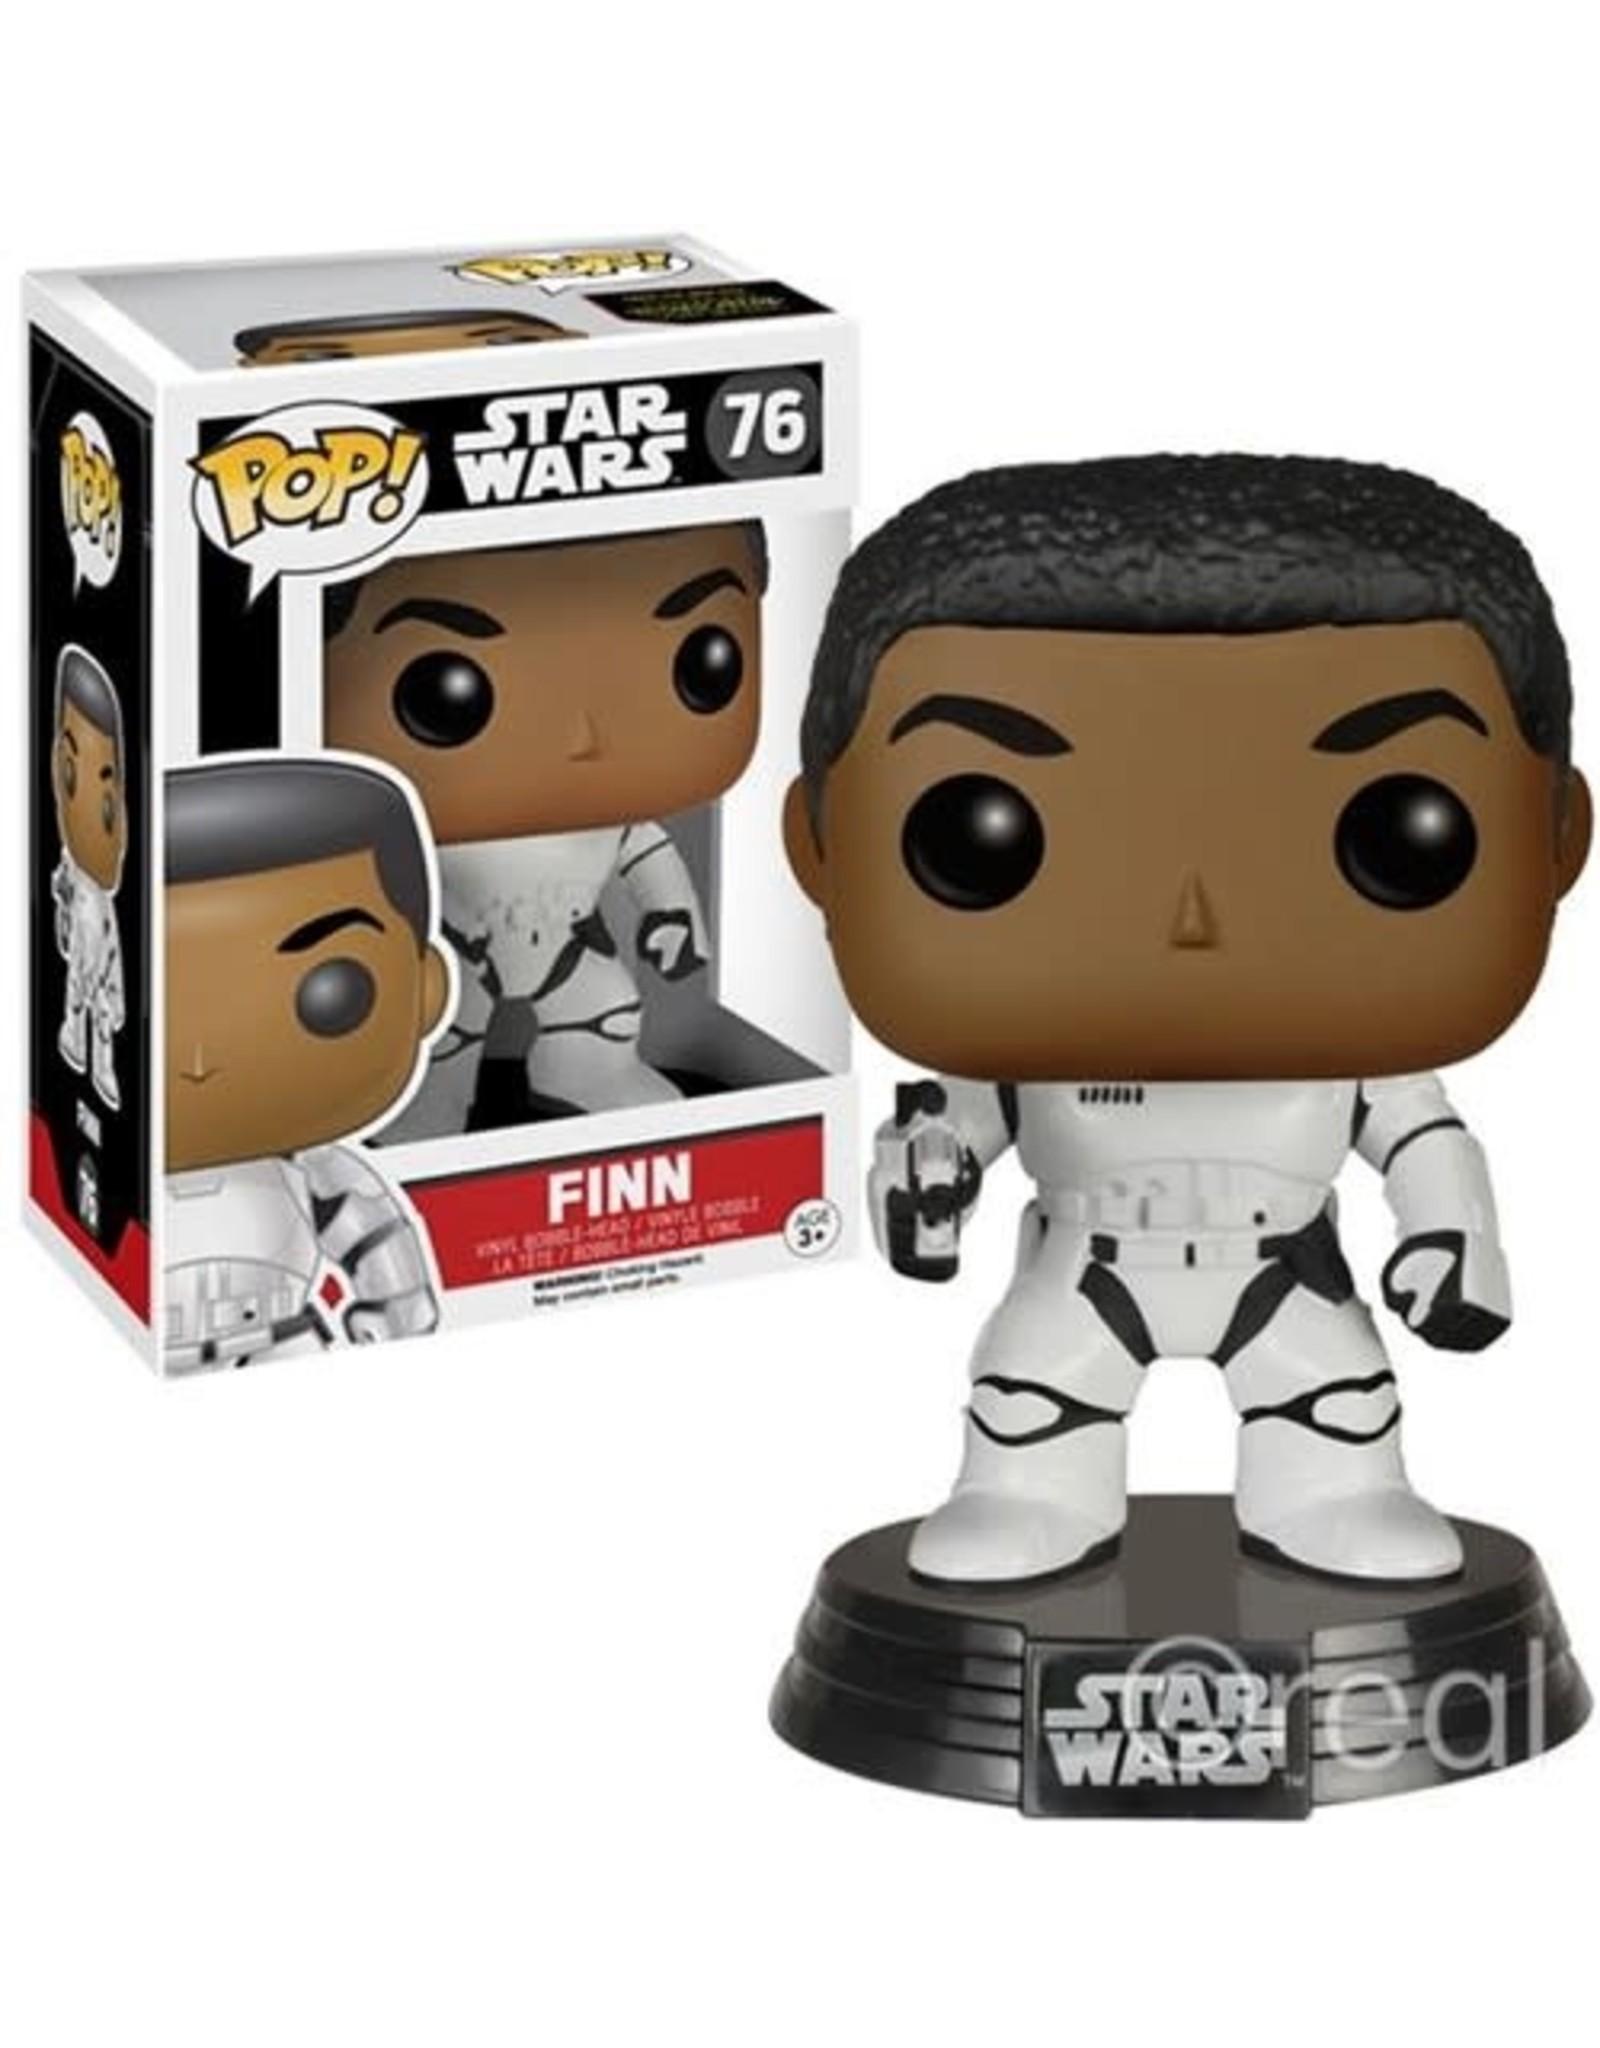 Funko Pop! Funko Pop! Star Wars nr076 Finn Stormtrooper